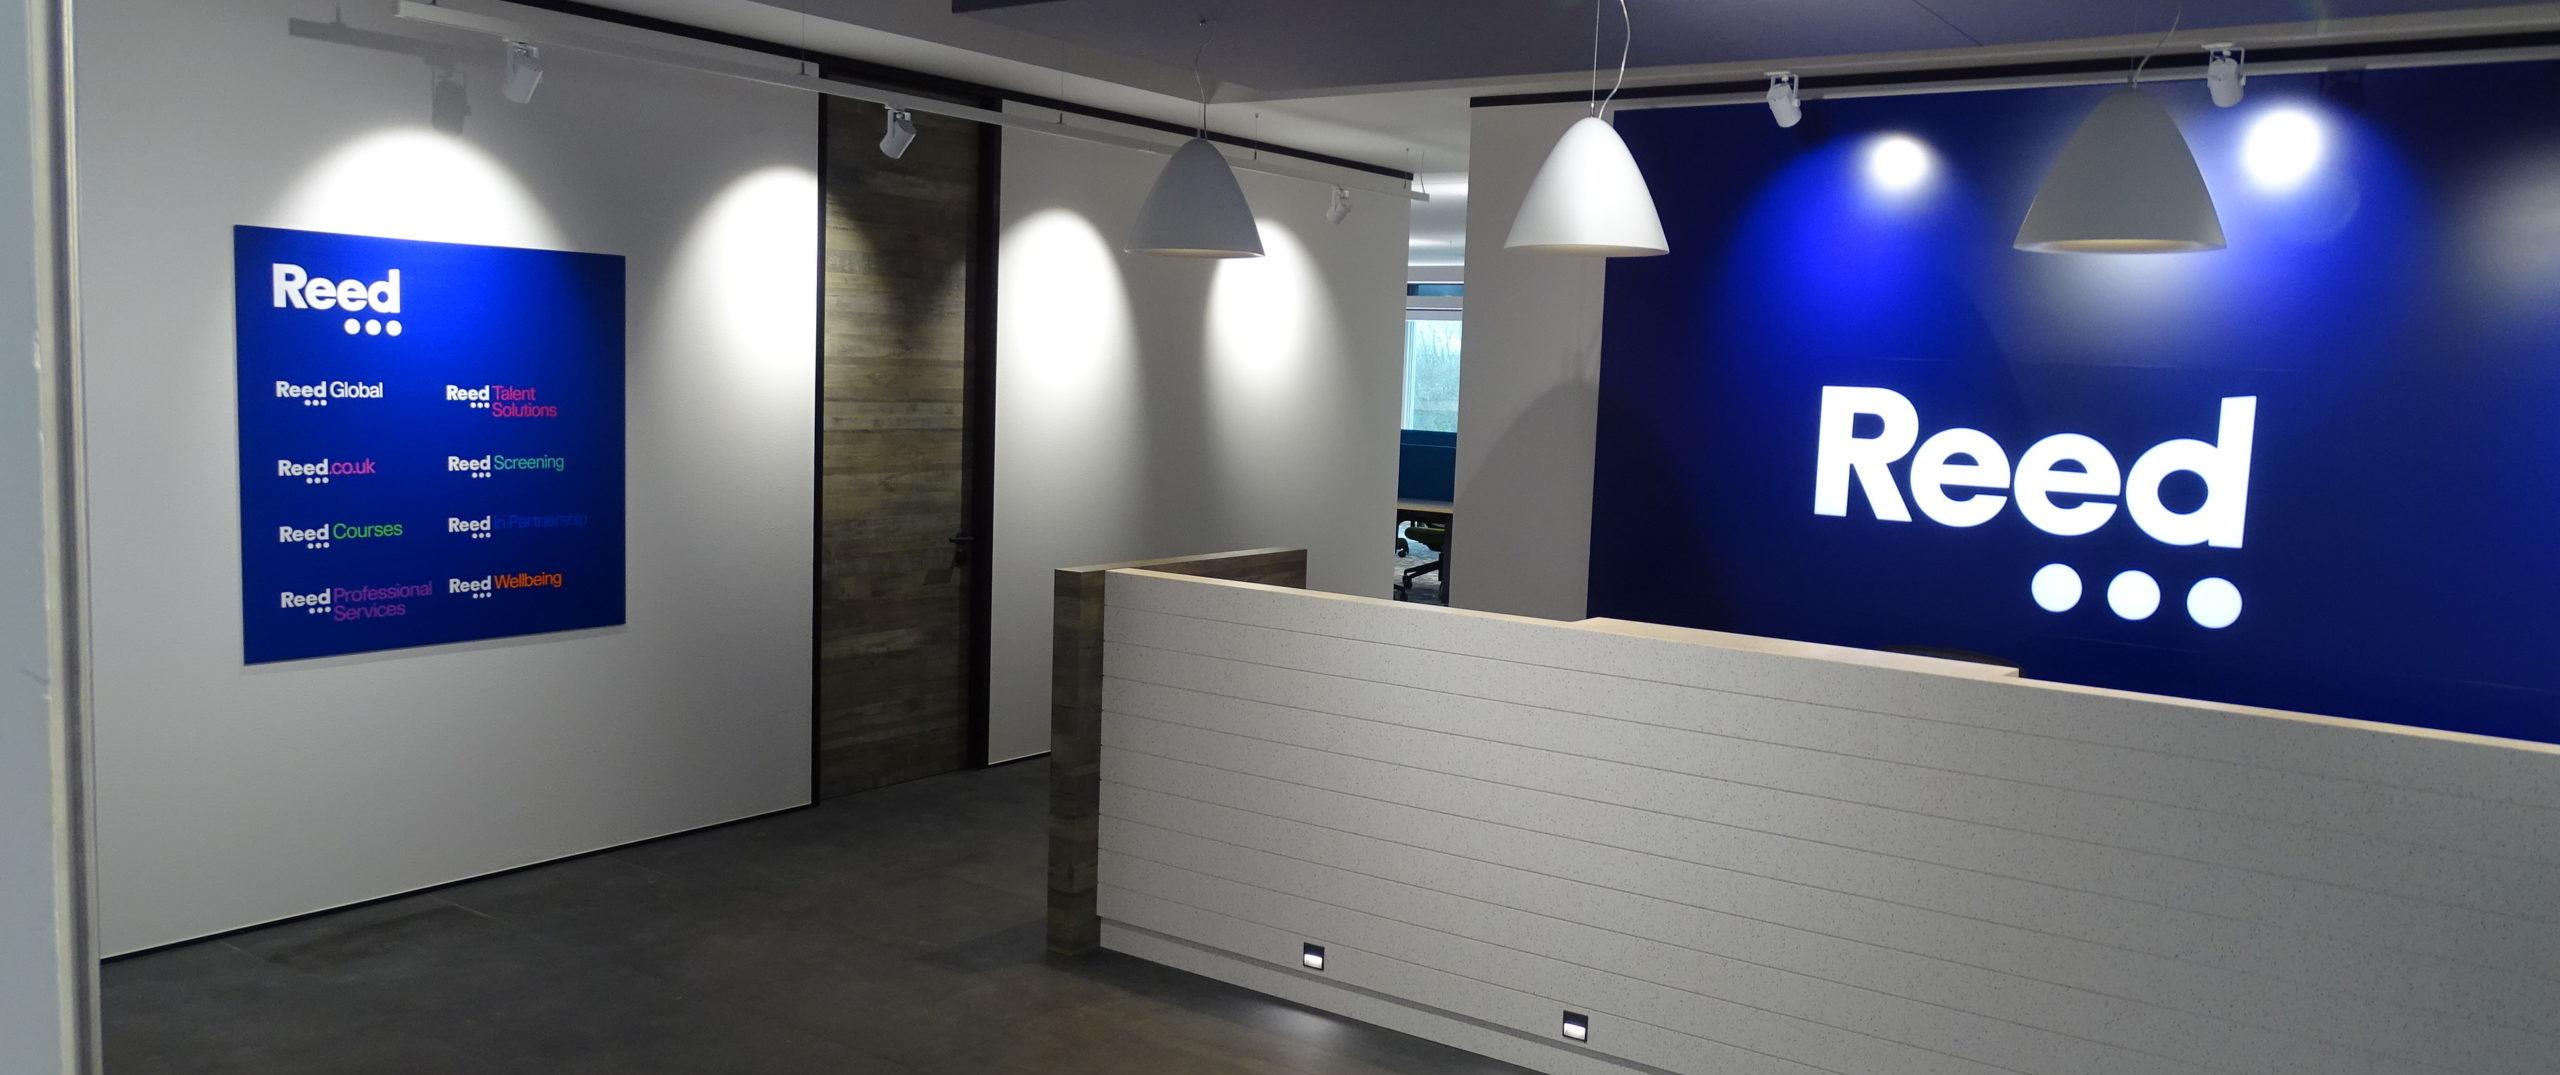 Reed reception N900 - northampton office UK